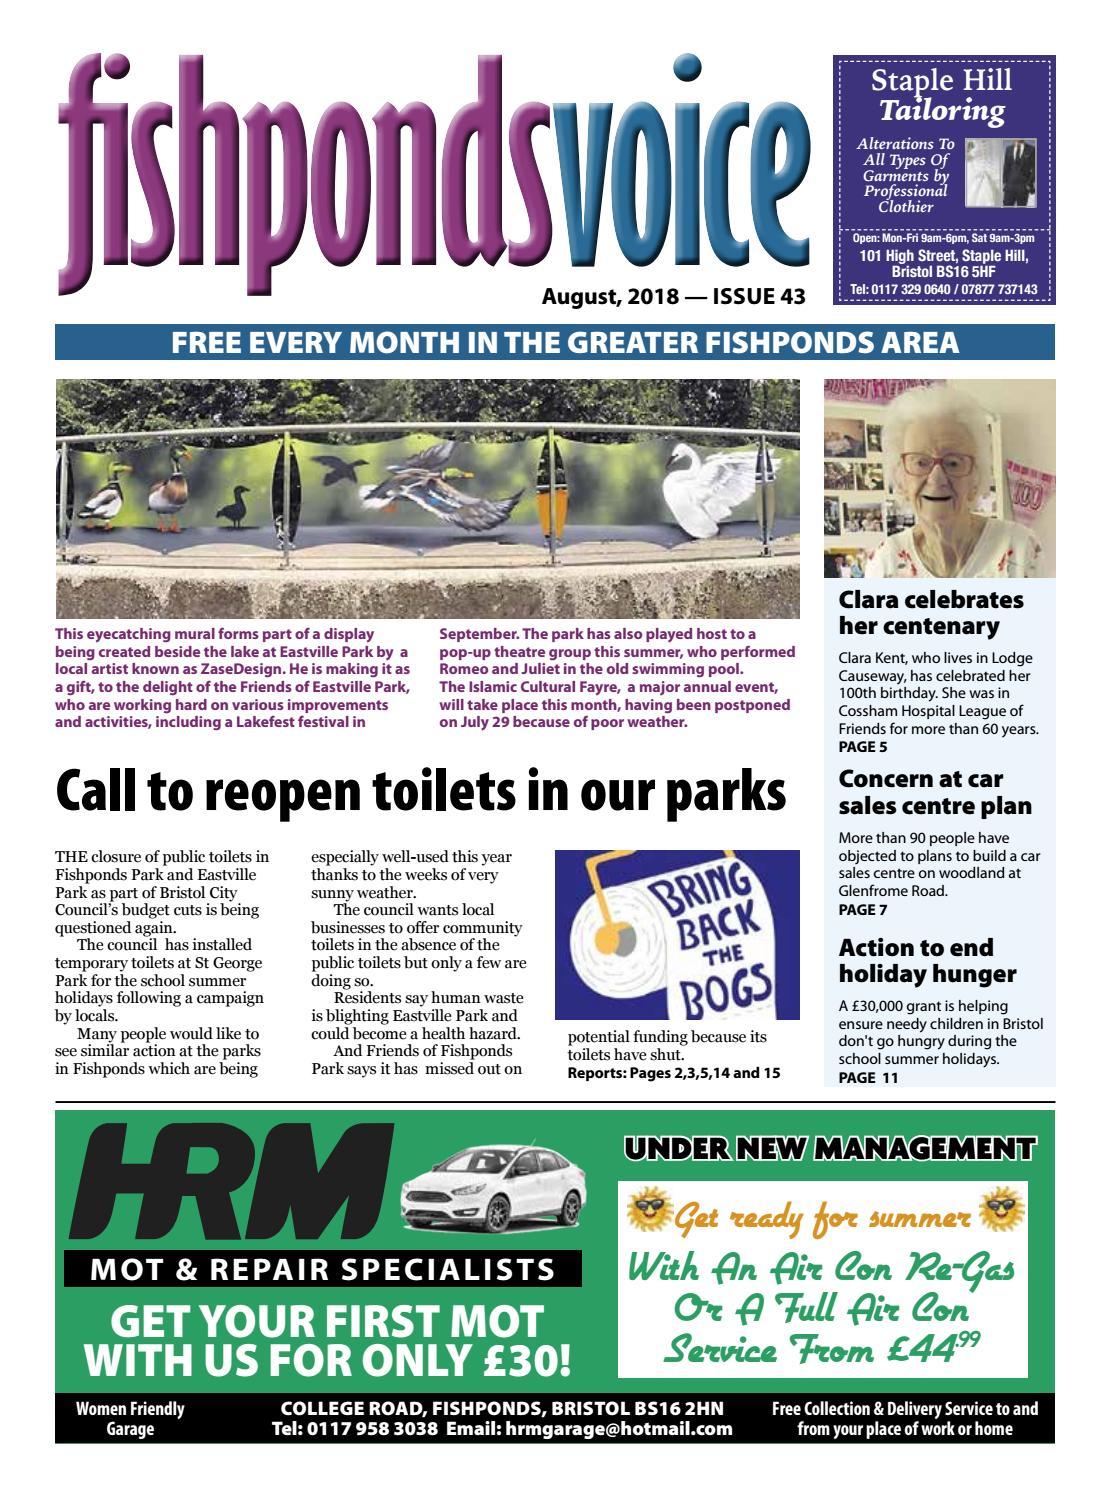 Eastville park toilets